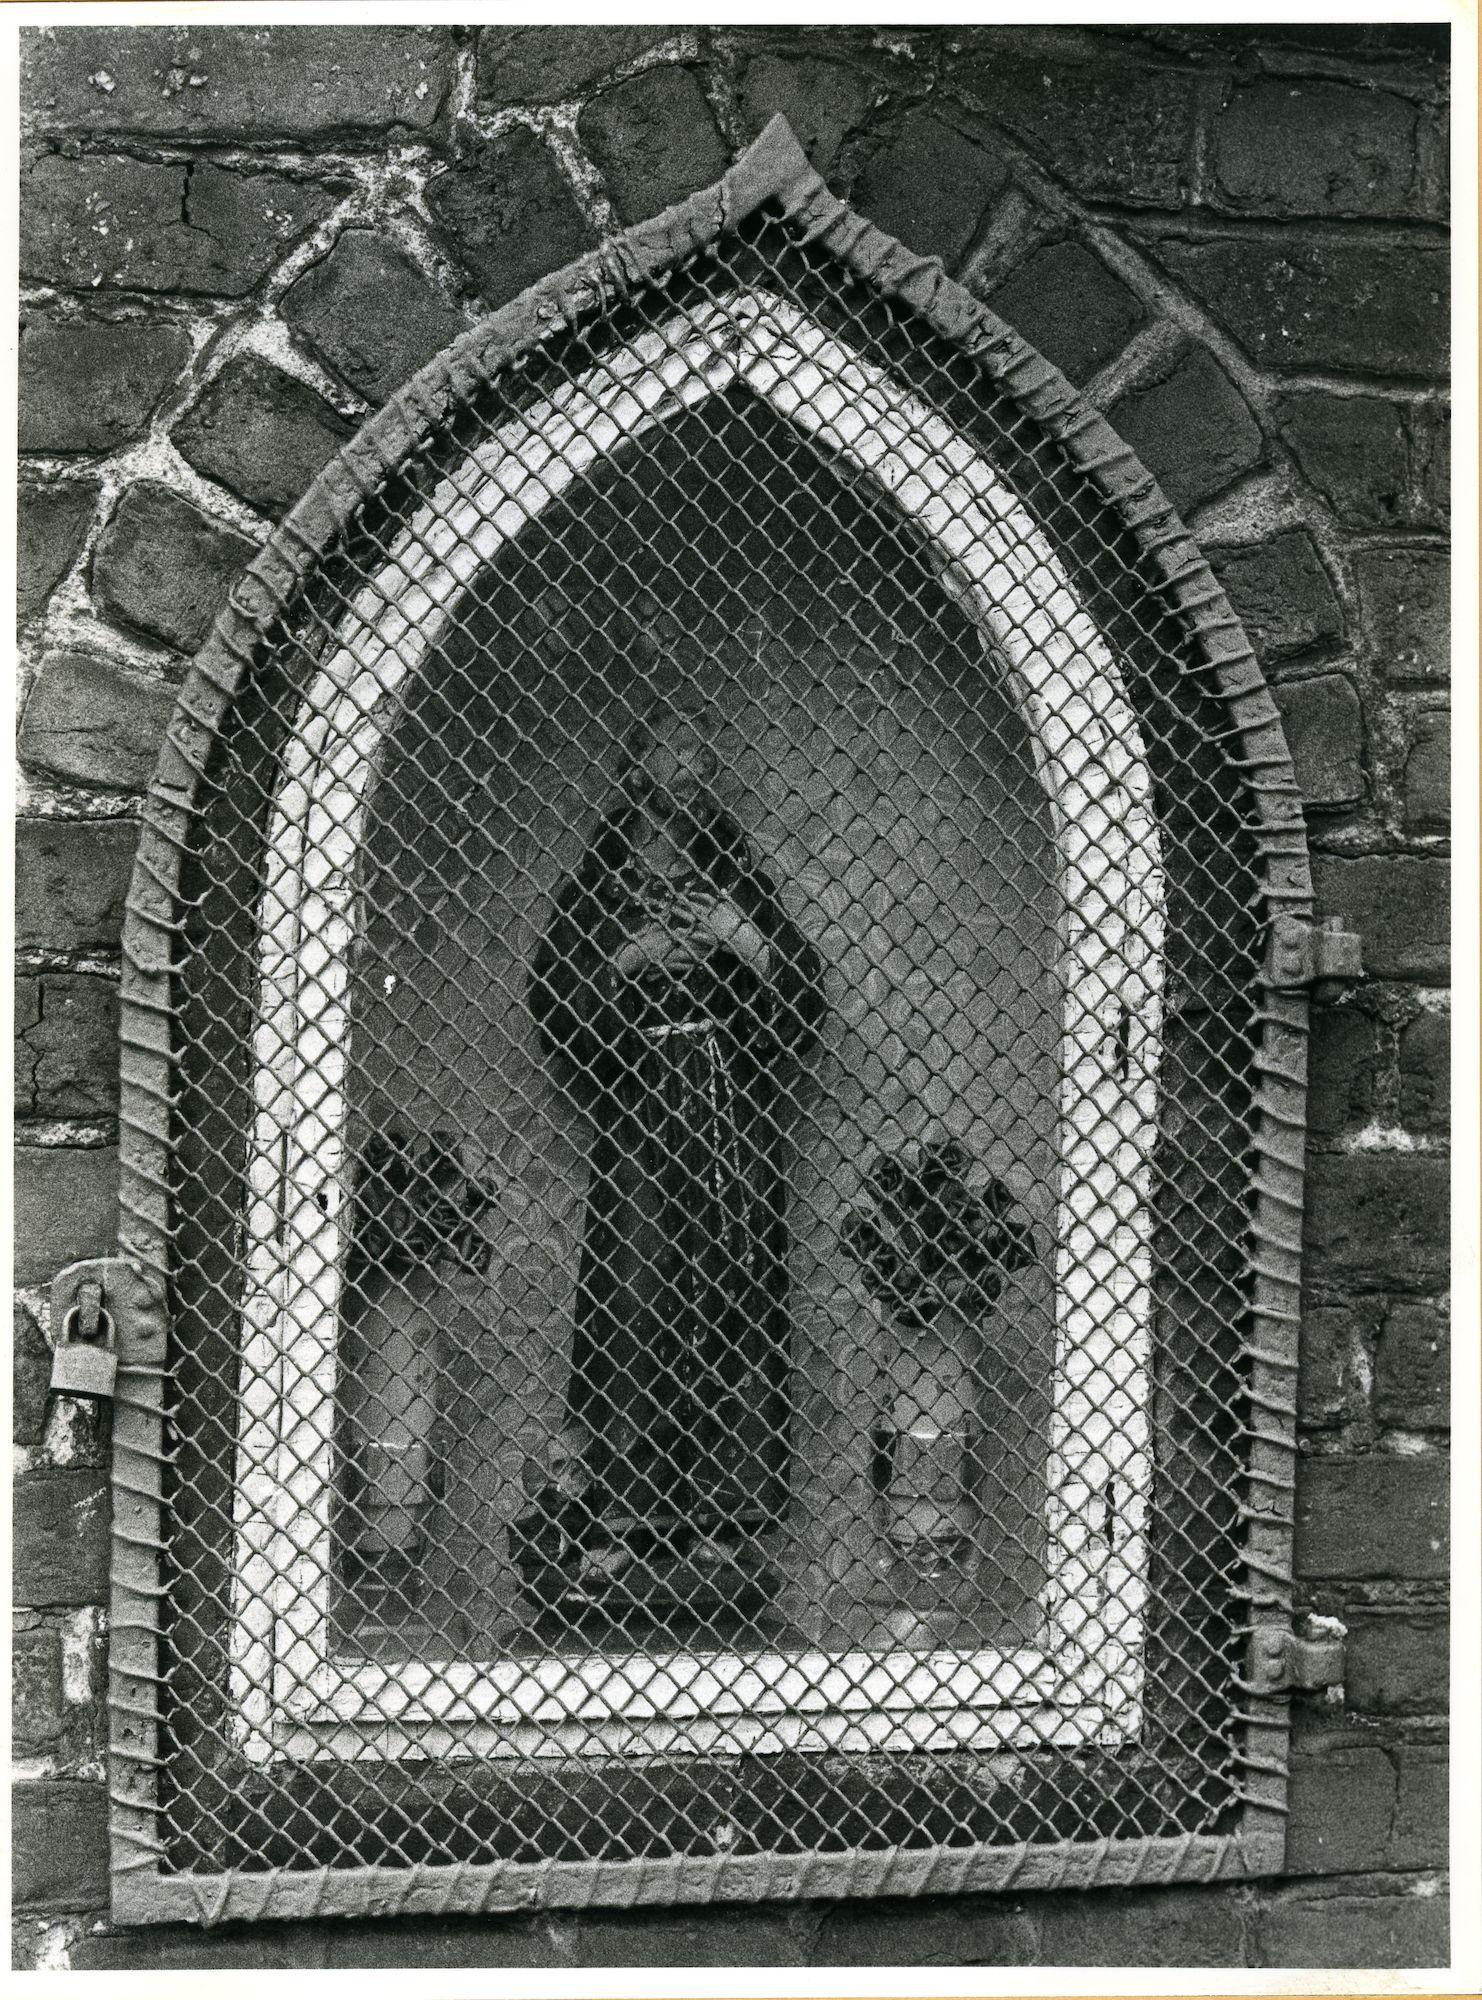 Sint-Amandsberg: O.L.Vrouwstraat 88: Niskapel